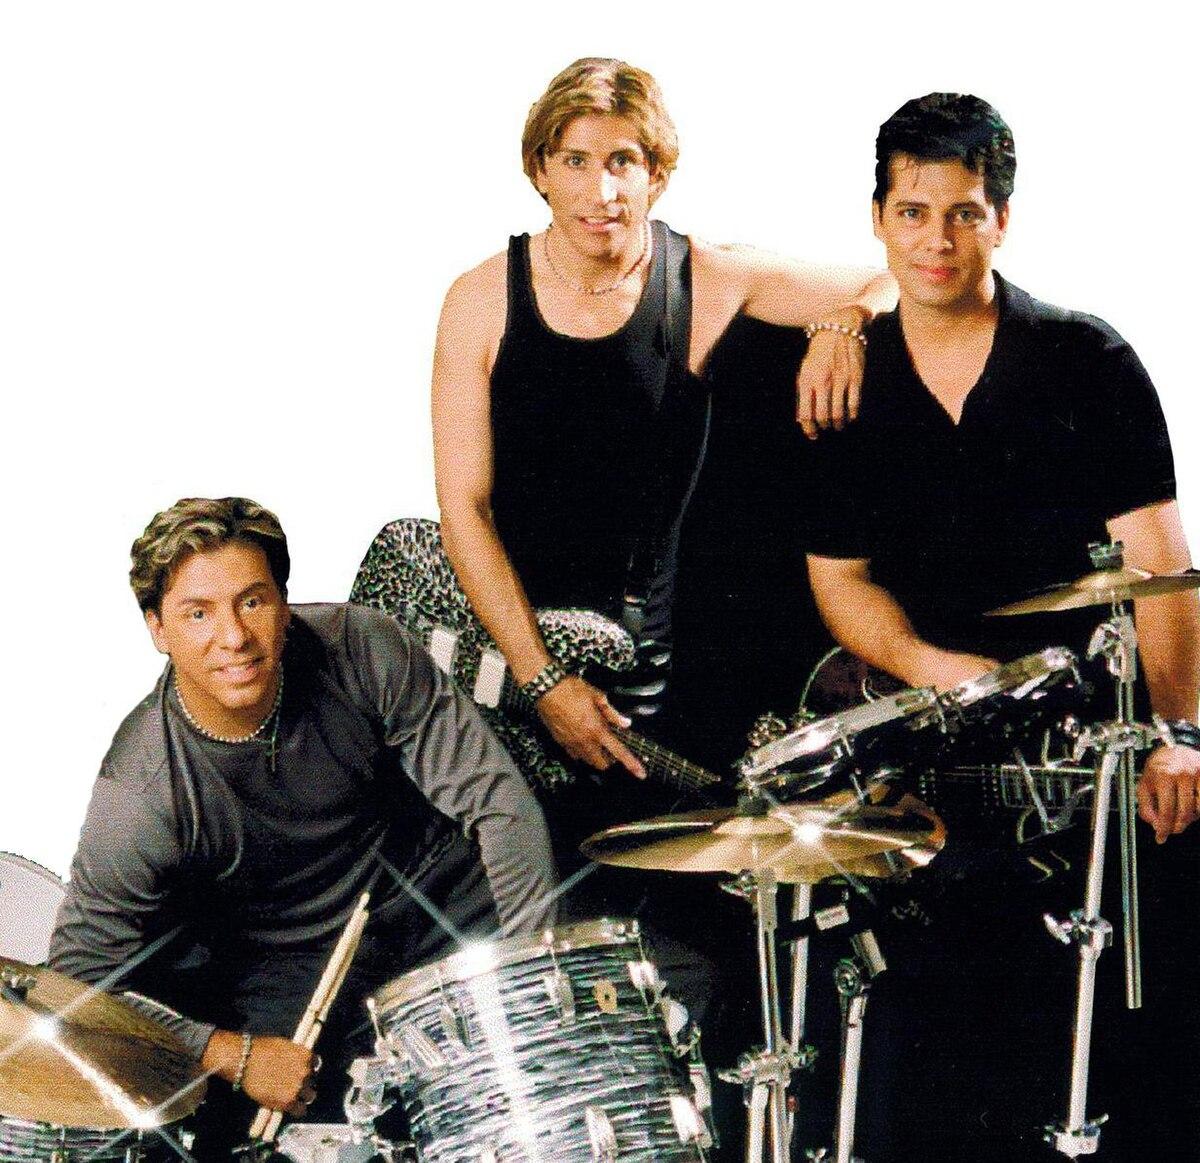 Banded Bands: Renegade (band)